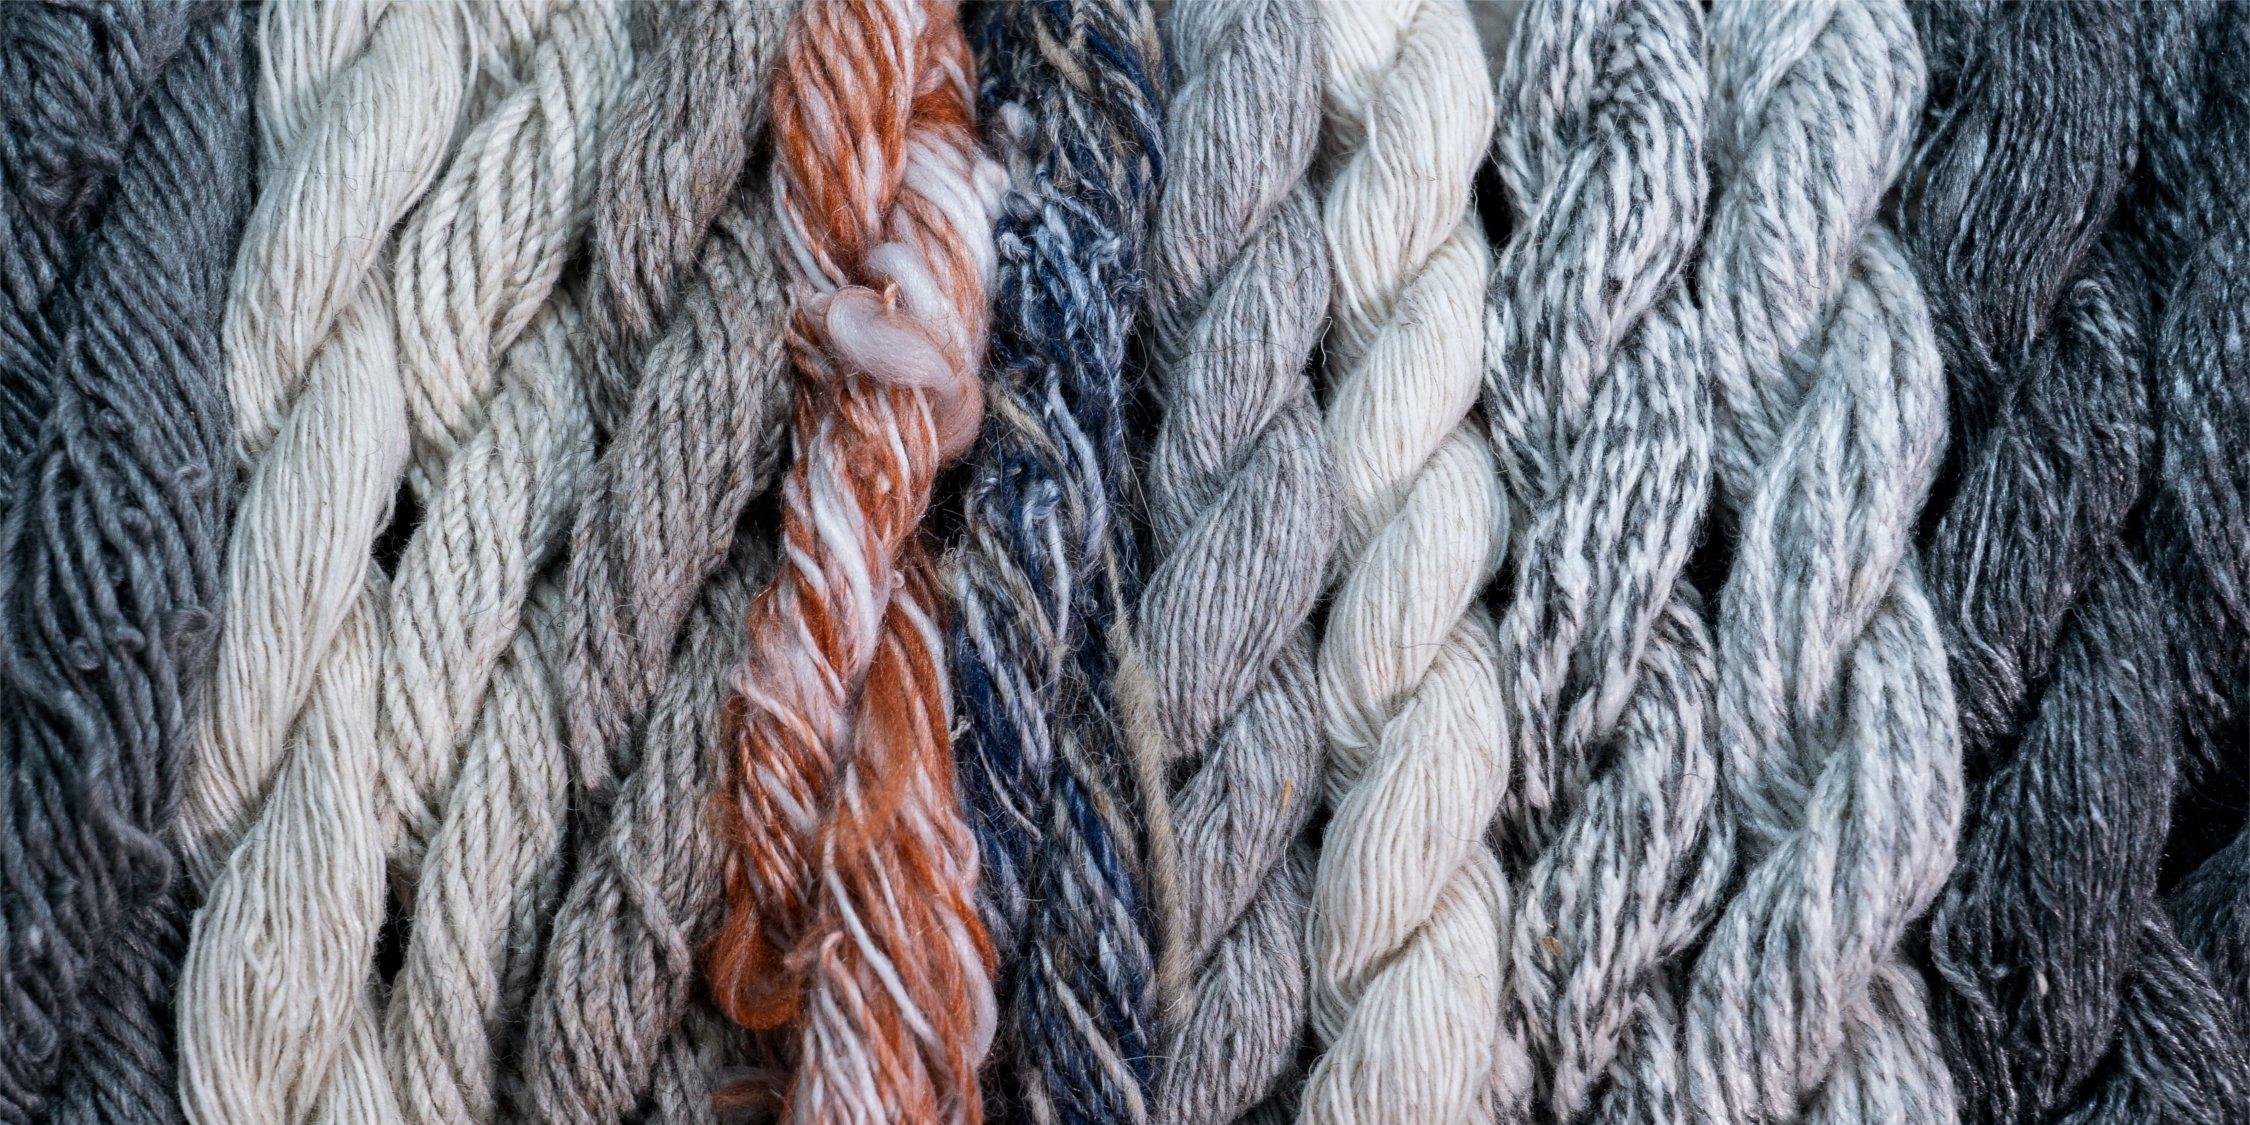 Besondere Materialeigenschaften Wolle